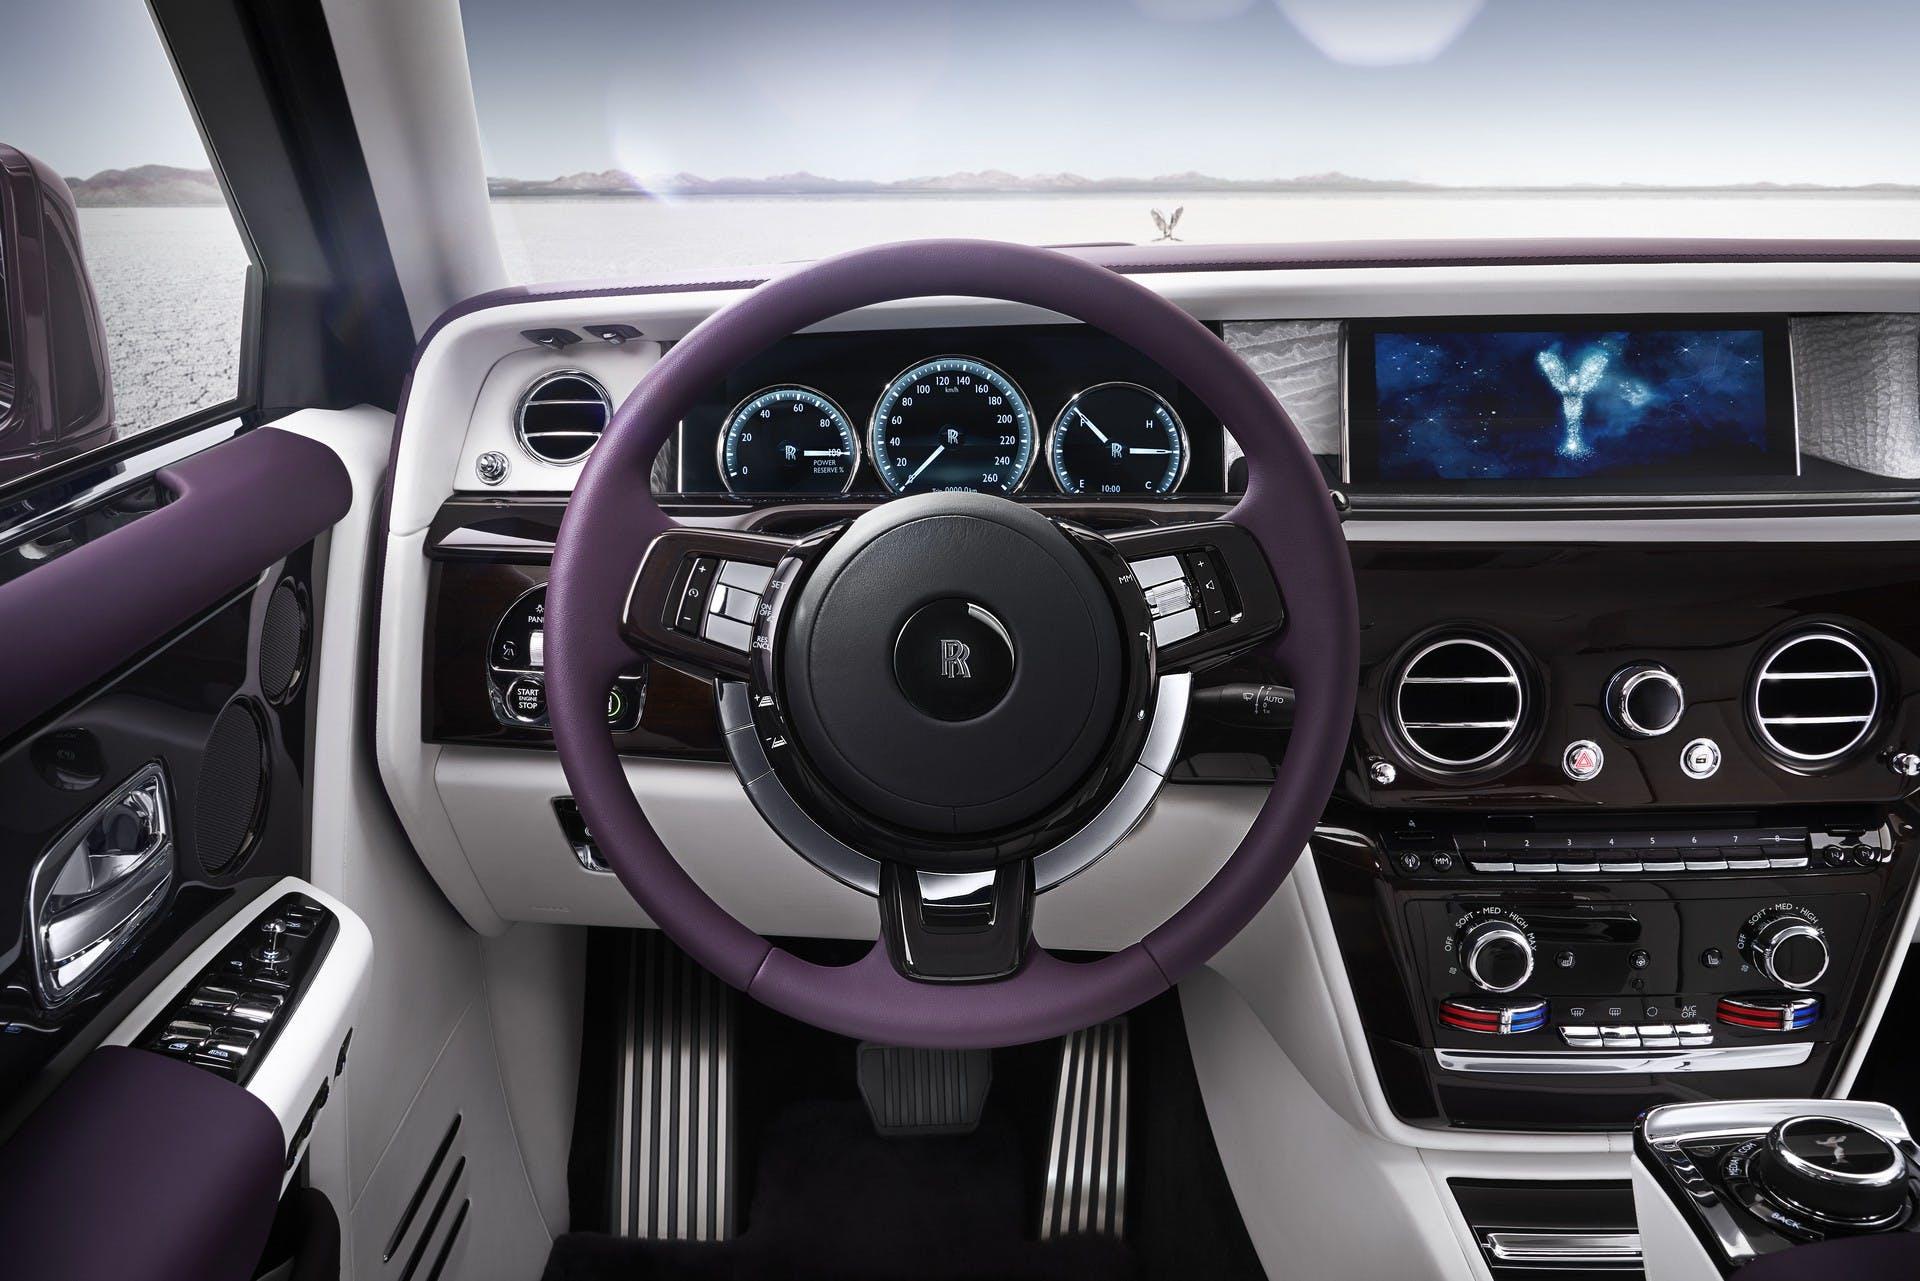 Rolls-Royce Phantom interni